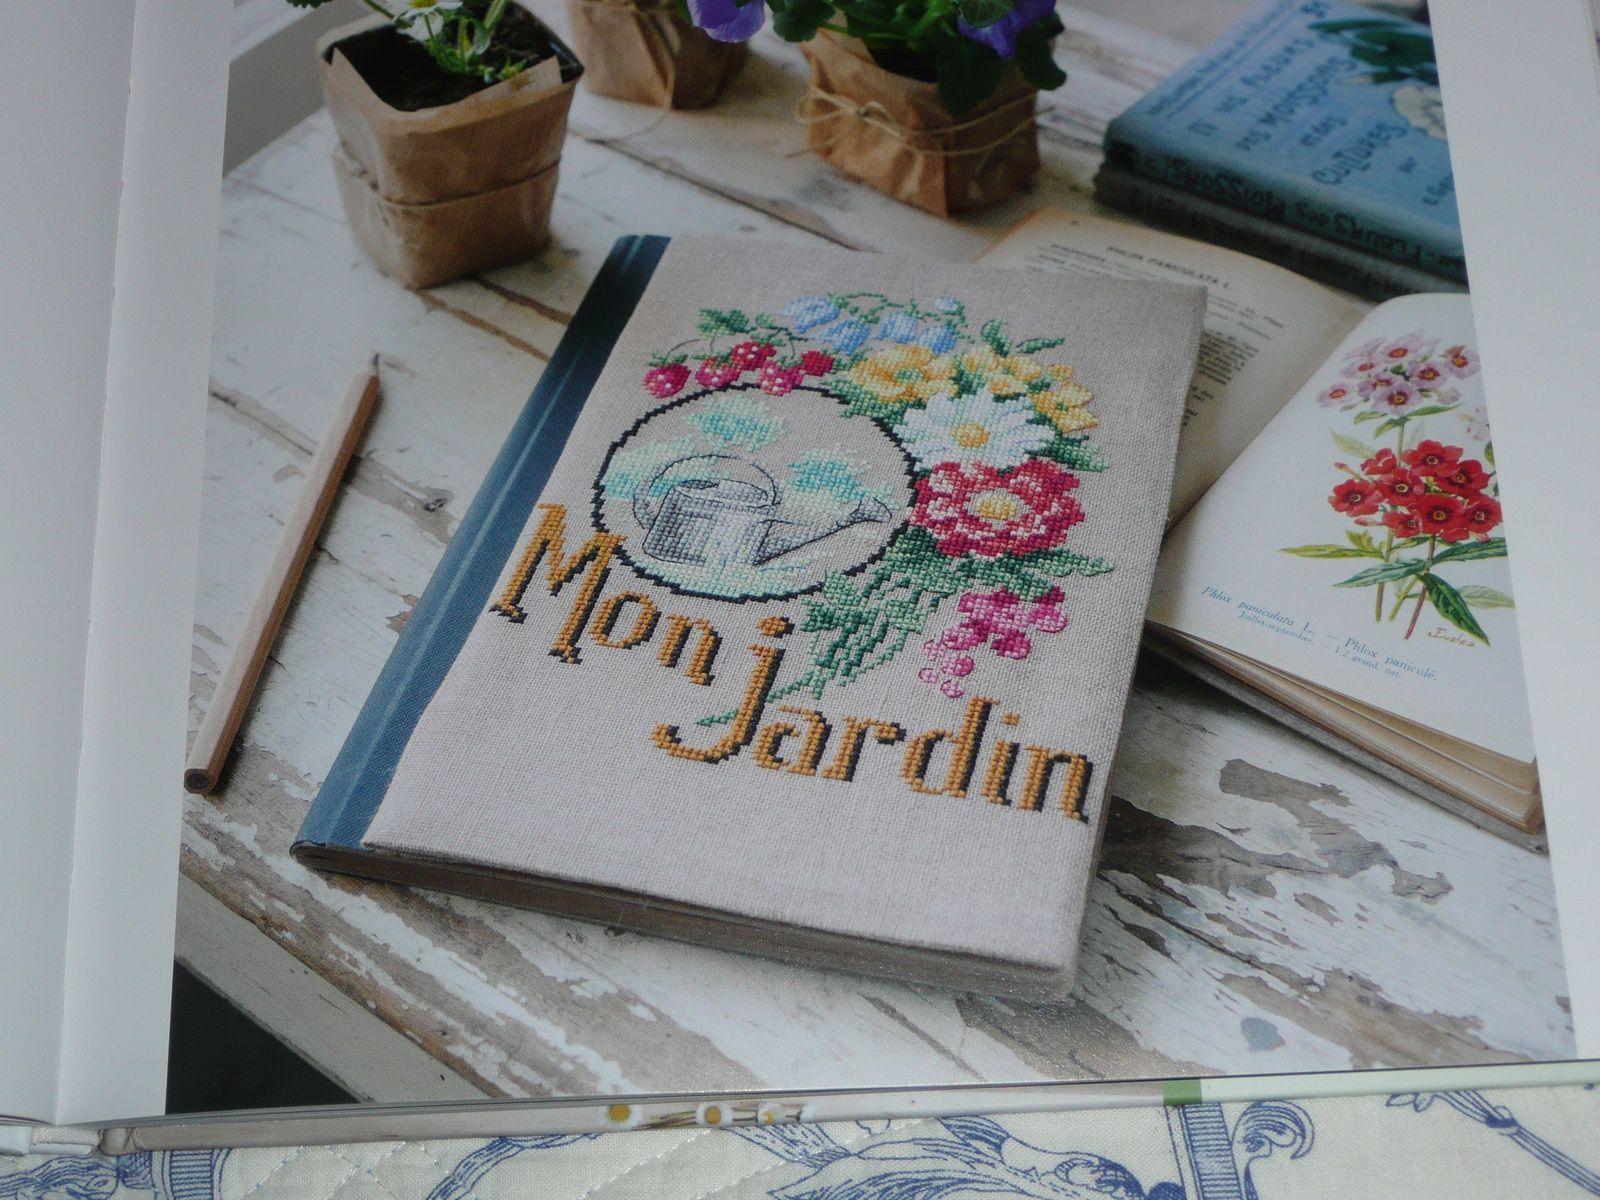 Le cahier du jardinier